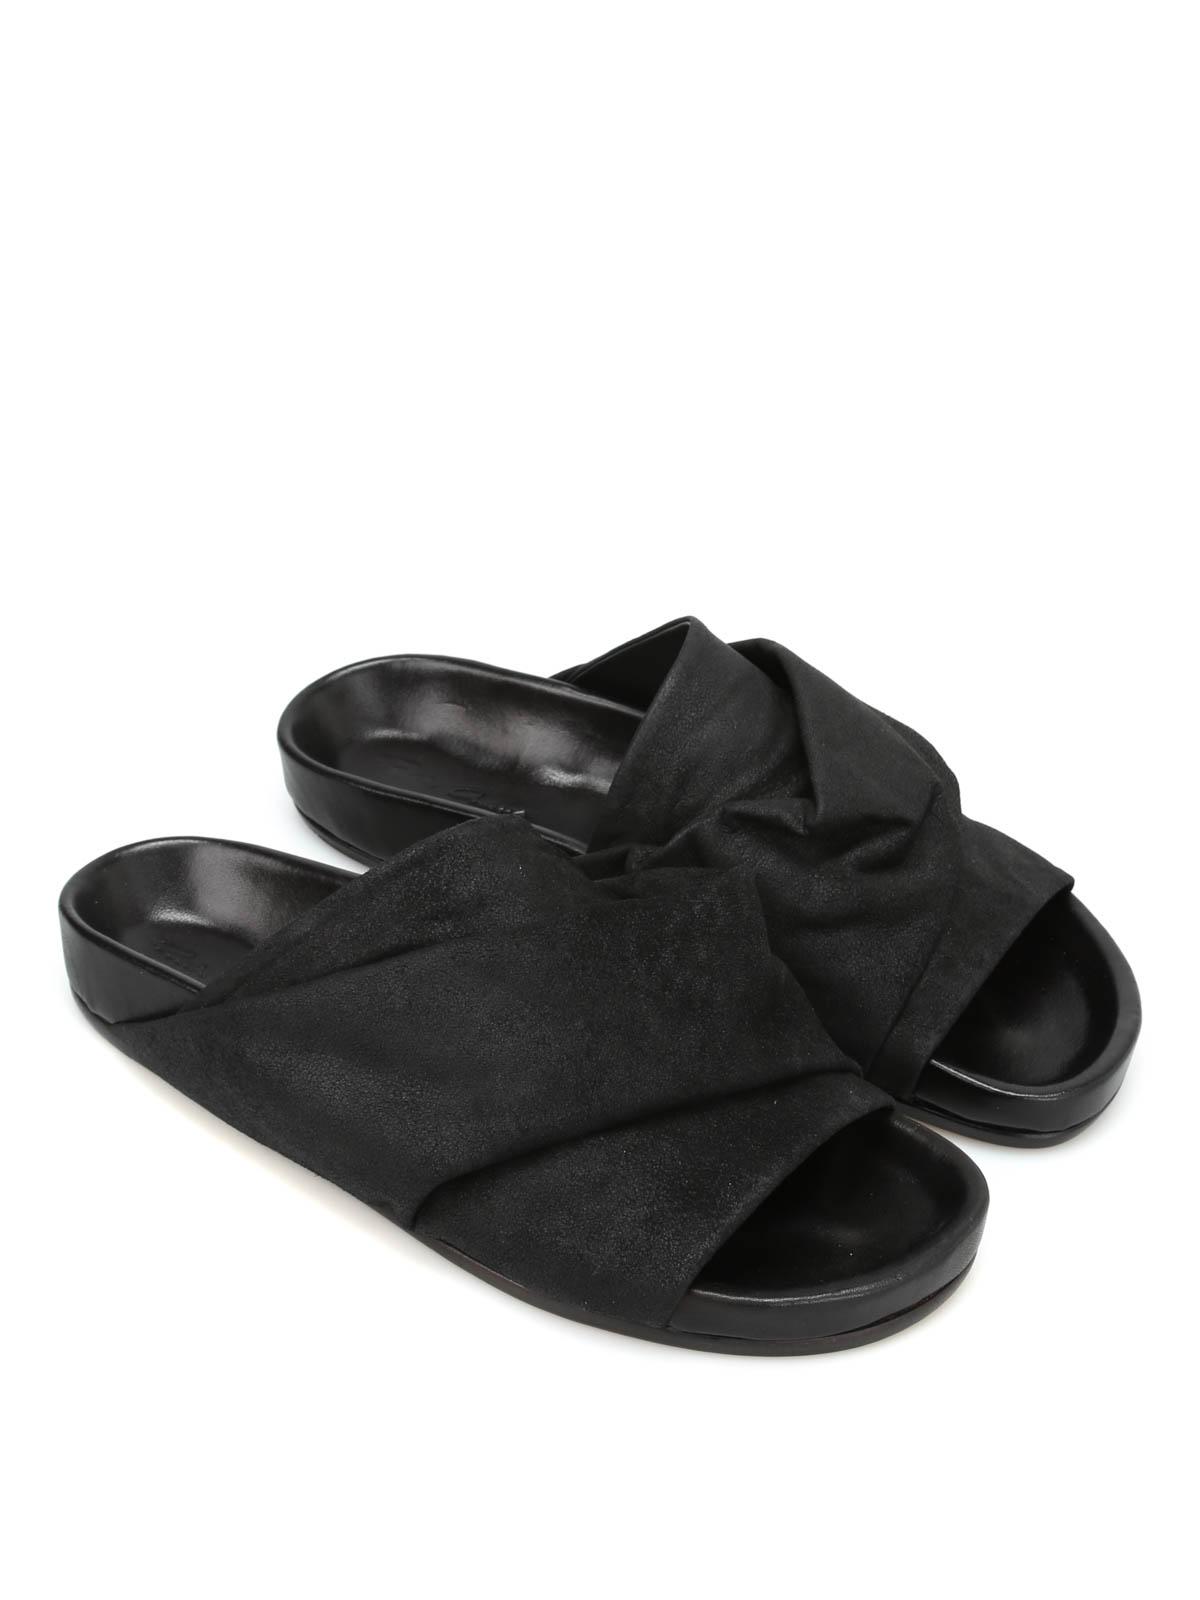 350fbef1890 RICK OWENS HUN  sandals online - Mobius Granola nubuk slide sandals